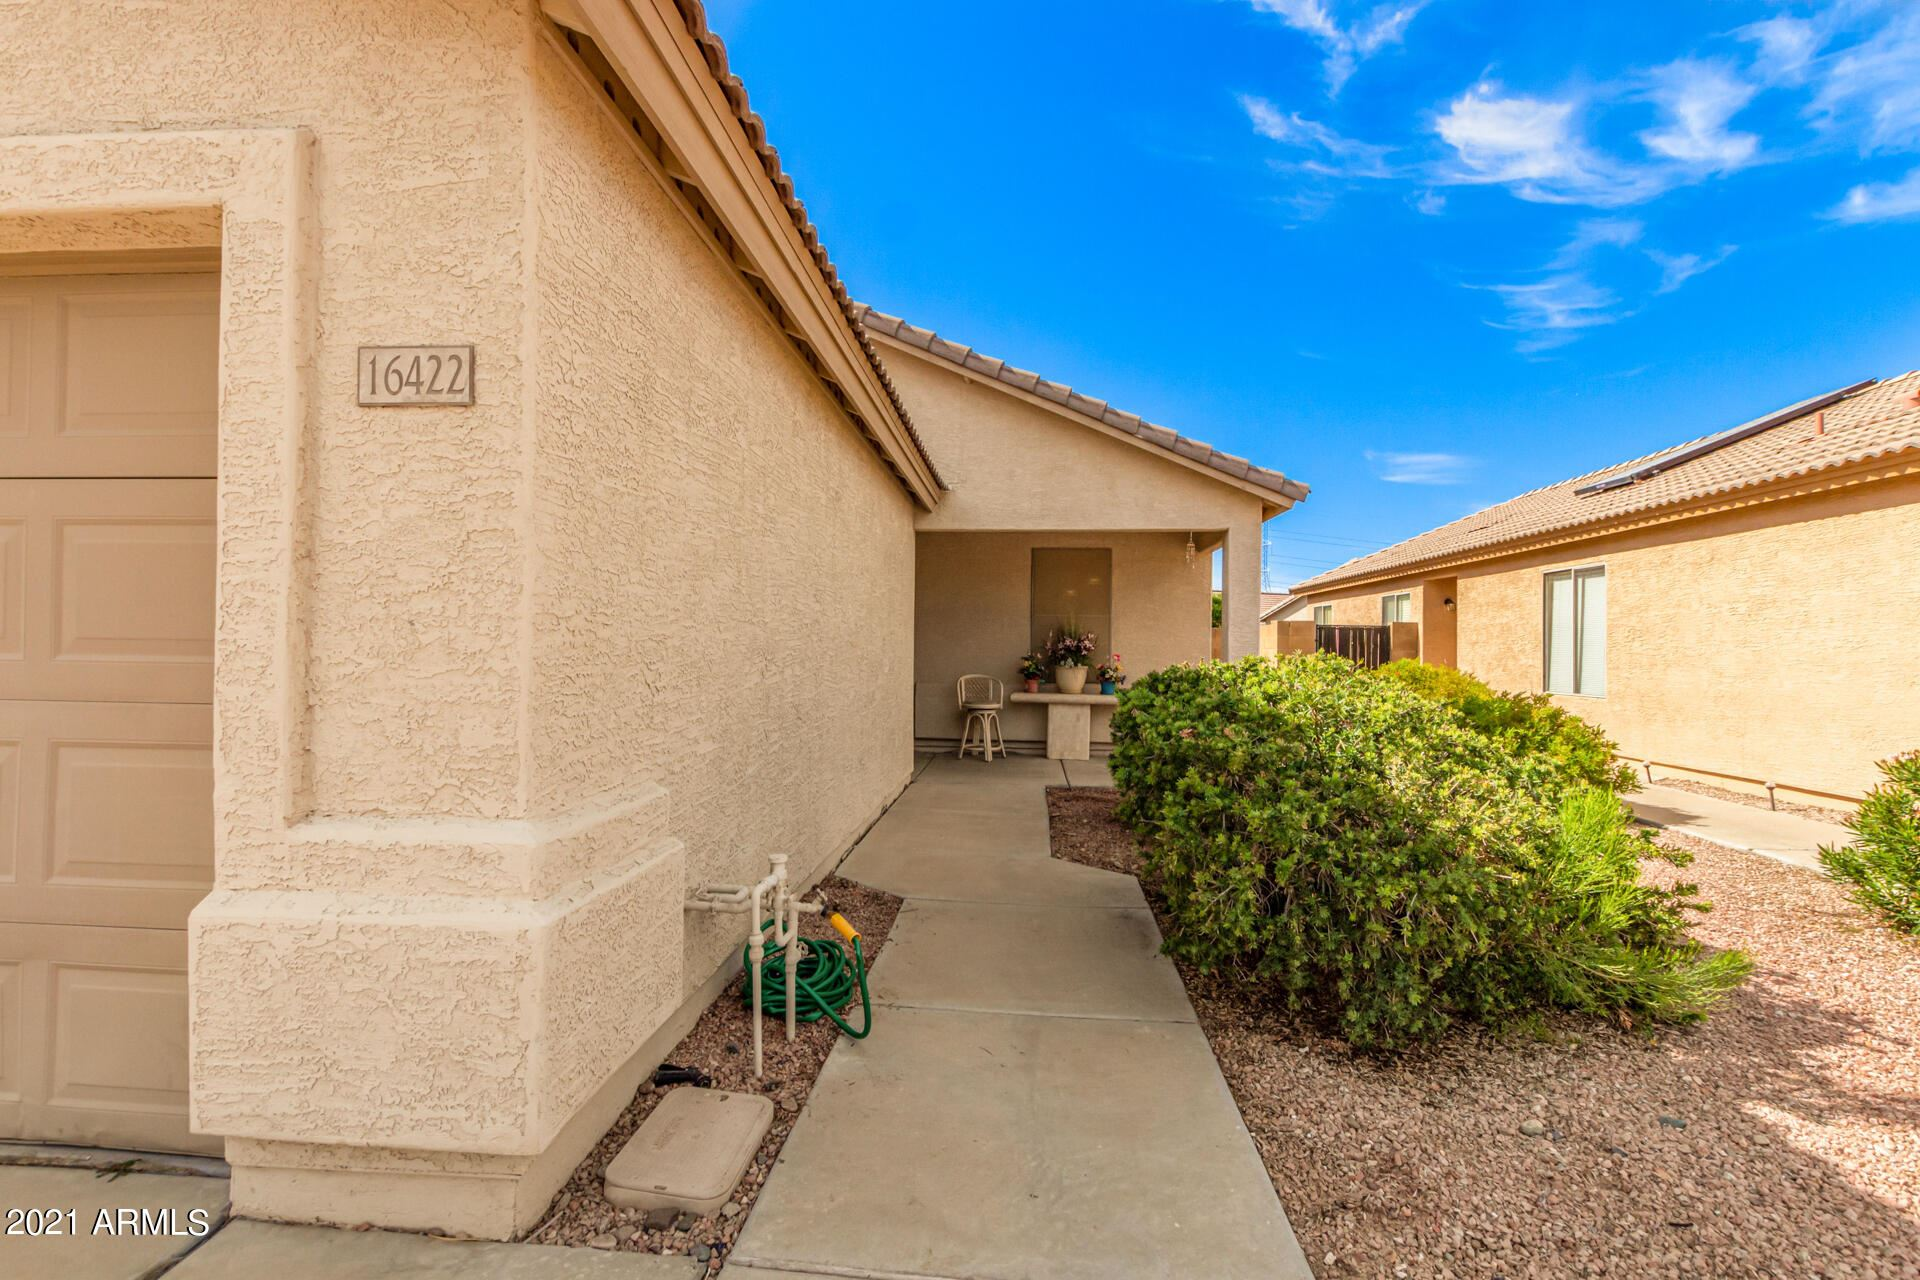 Photo of 16422 N 113TH Drive, Surprise, AZ 85378 (MLS # 6311517)